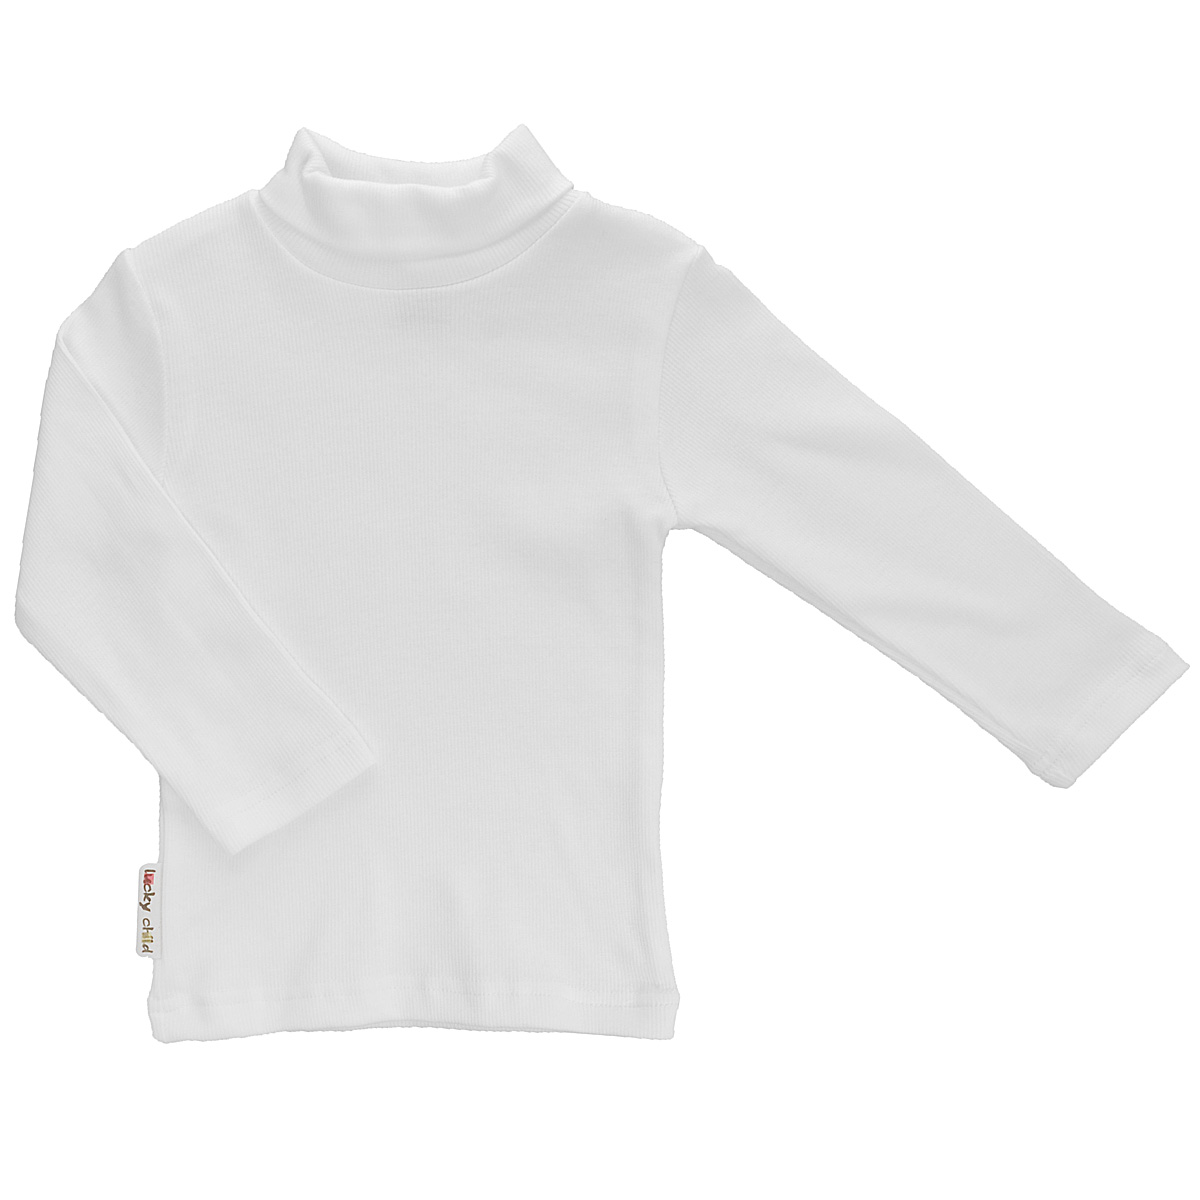 Водолазка детская Lucky Child, цвет: белый. 7-11. Размер 122/128